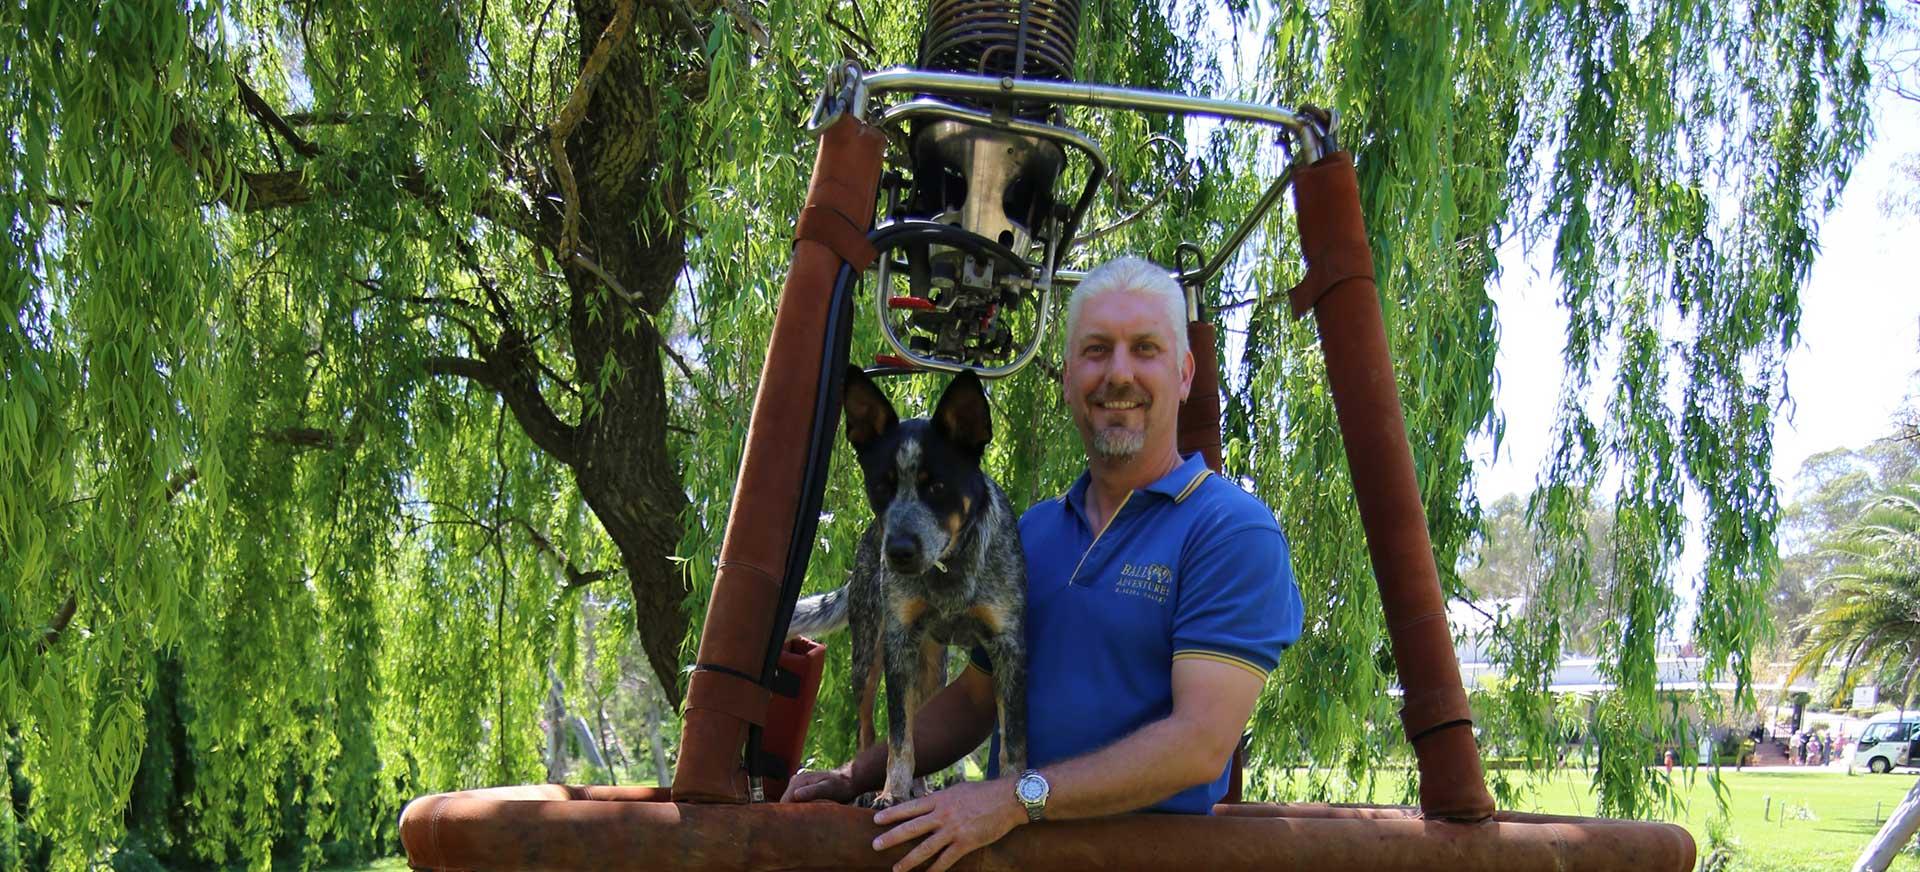 balloon Adventures pilot Justin Stein with German Shepherd